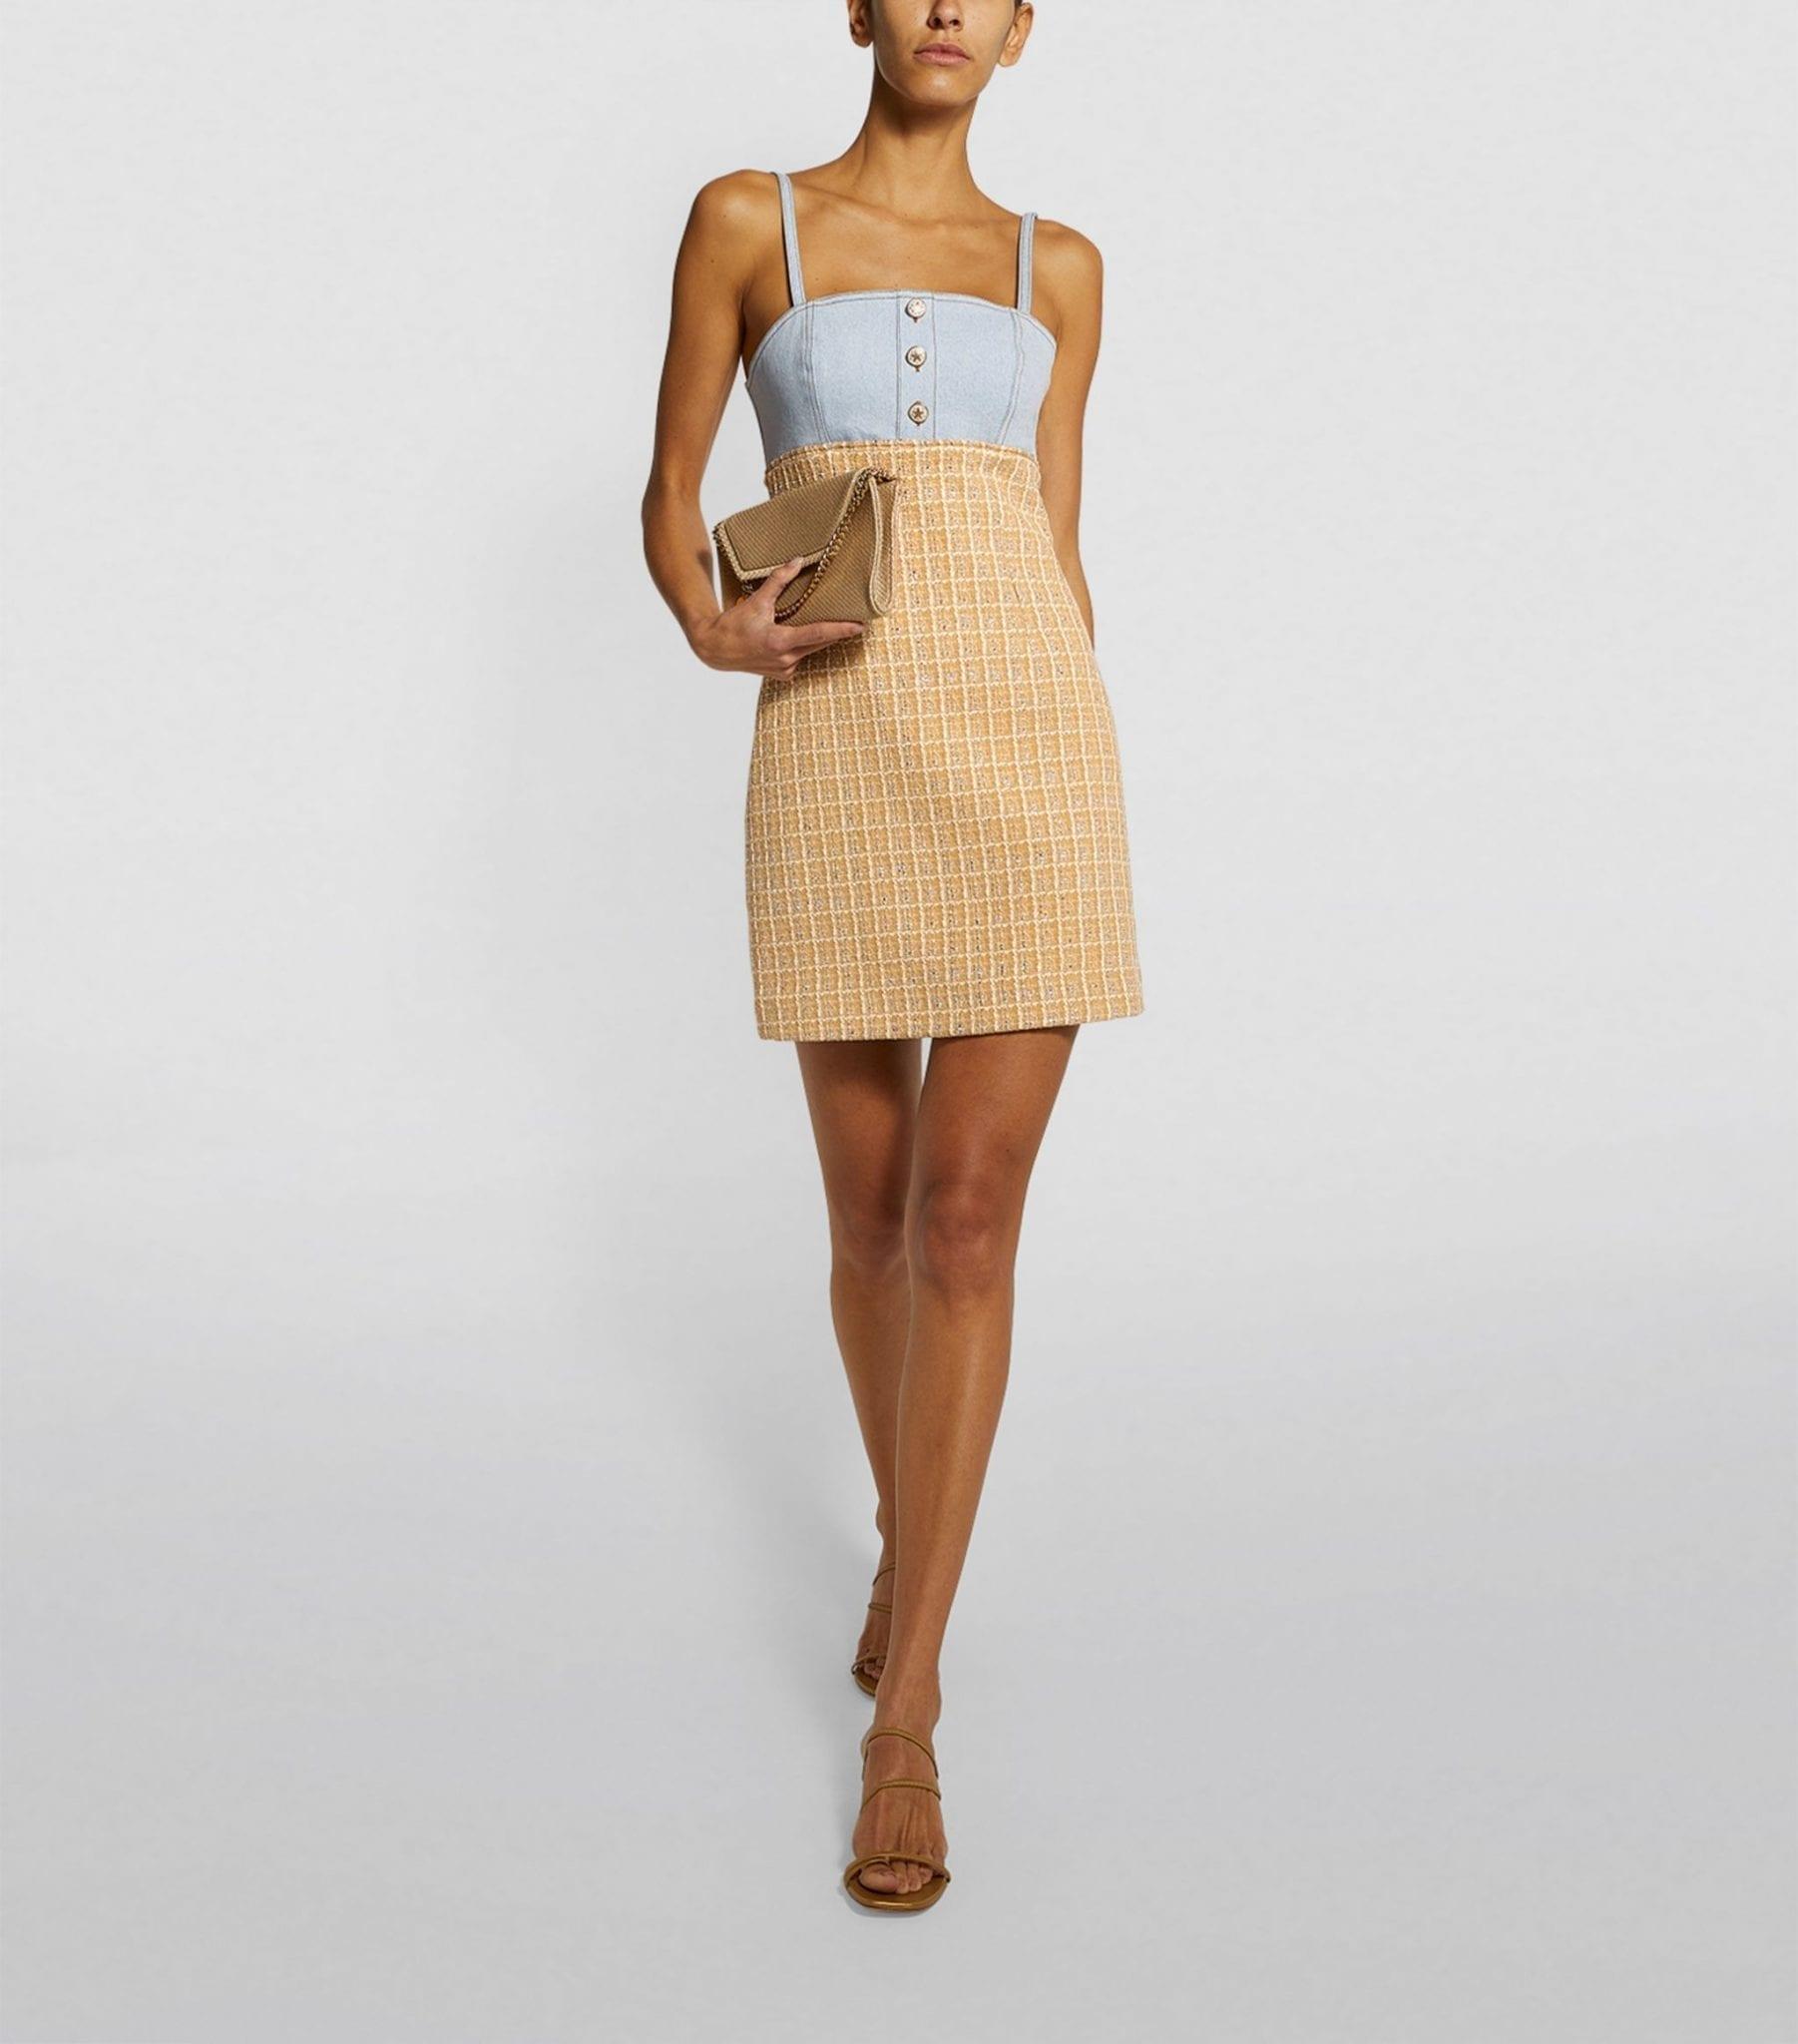 SANDRO PARIS Denim Tweed Mini Dress